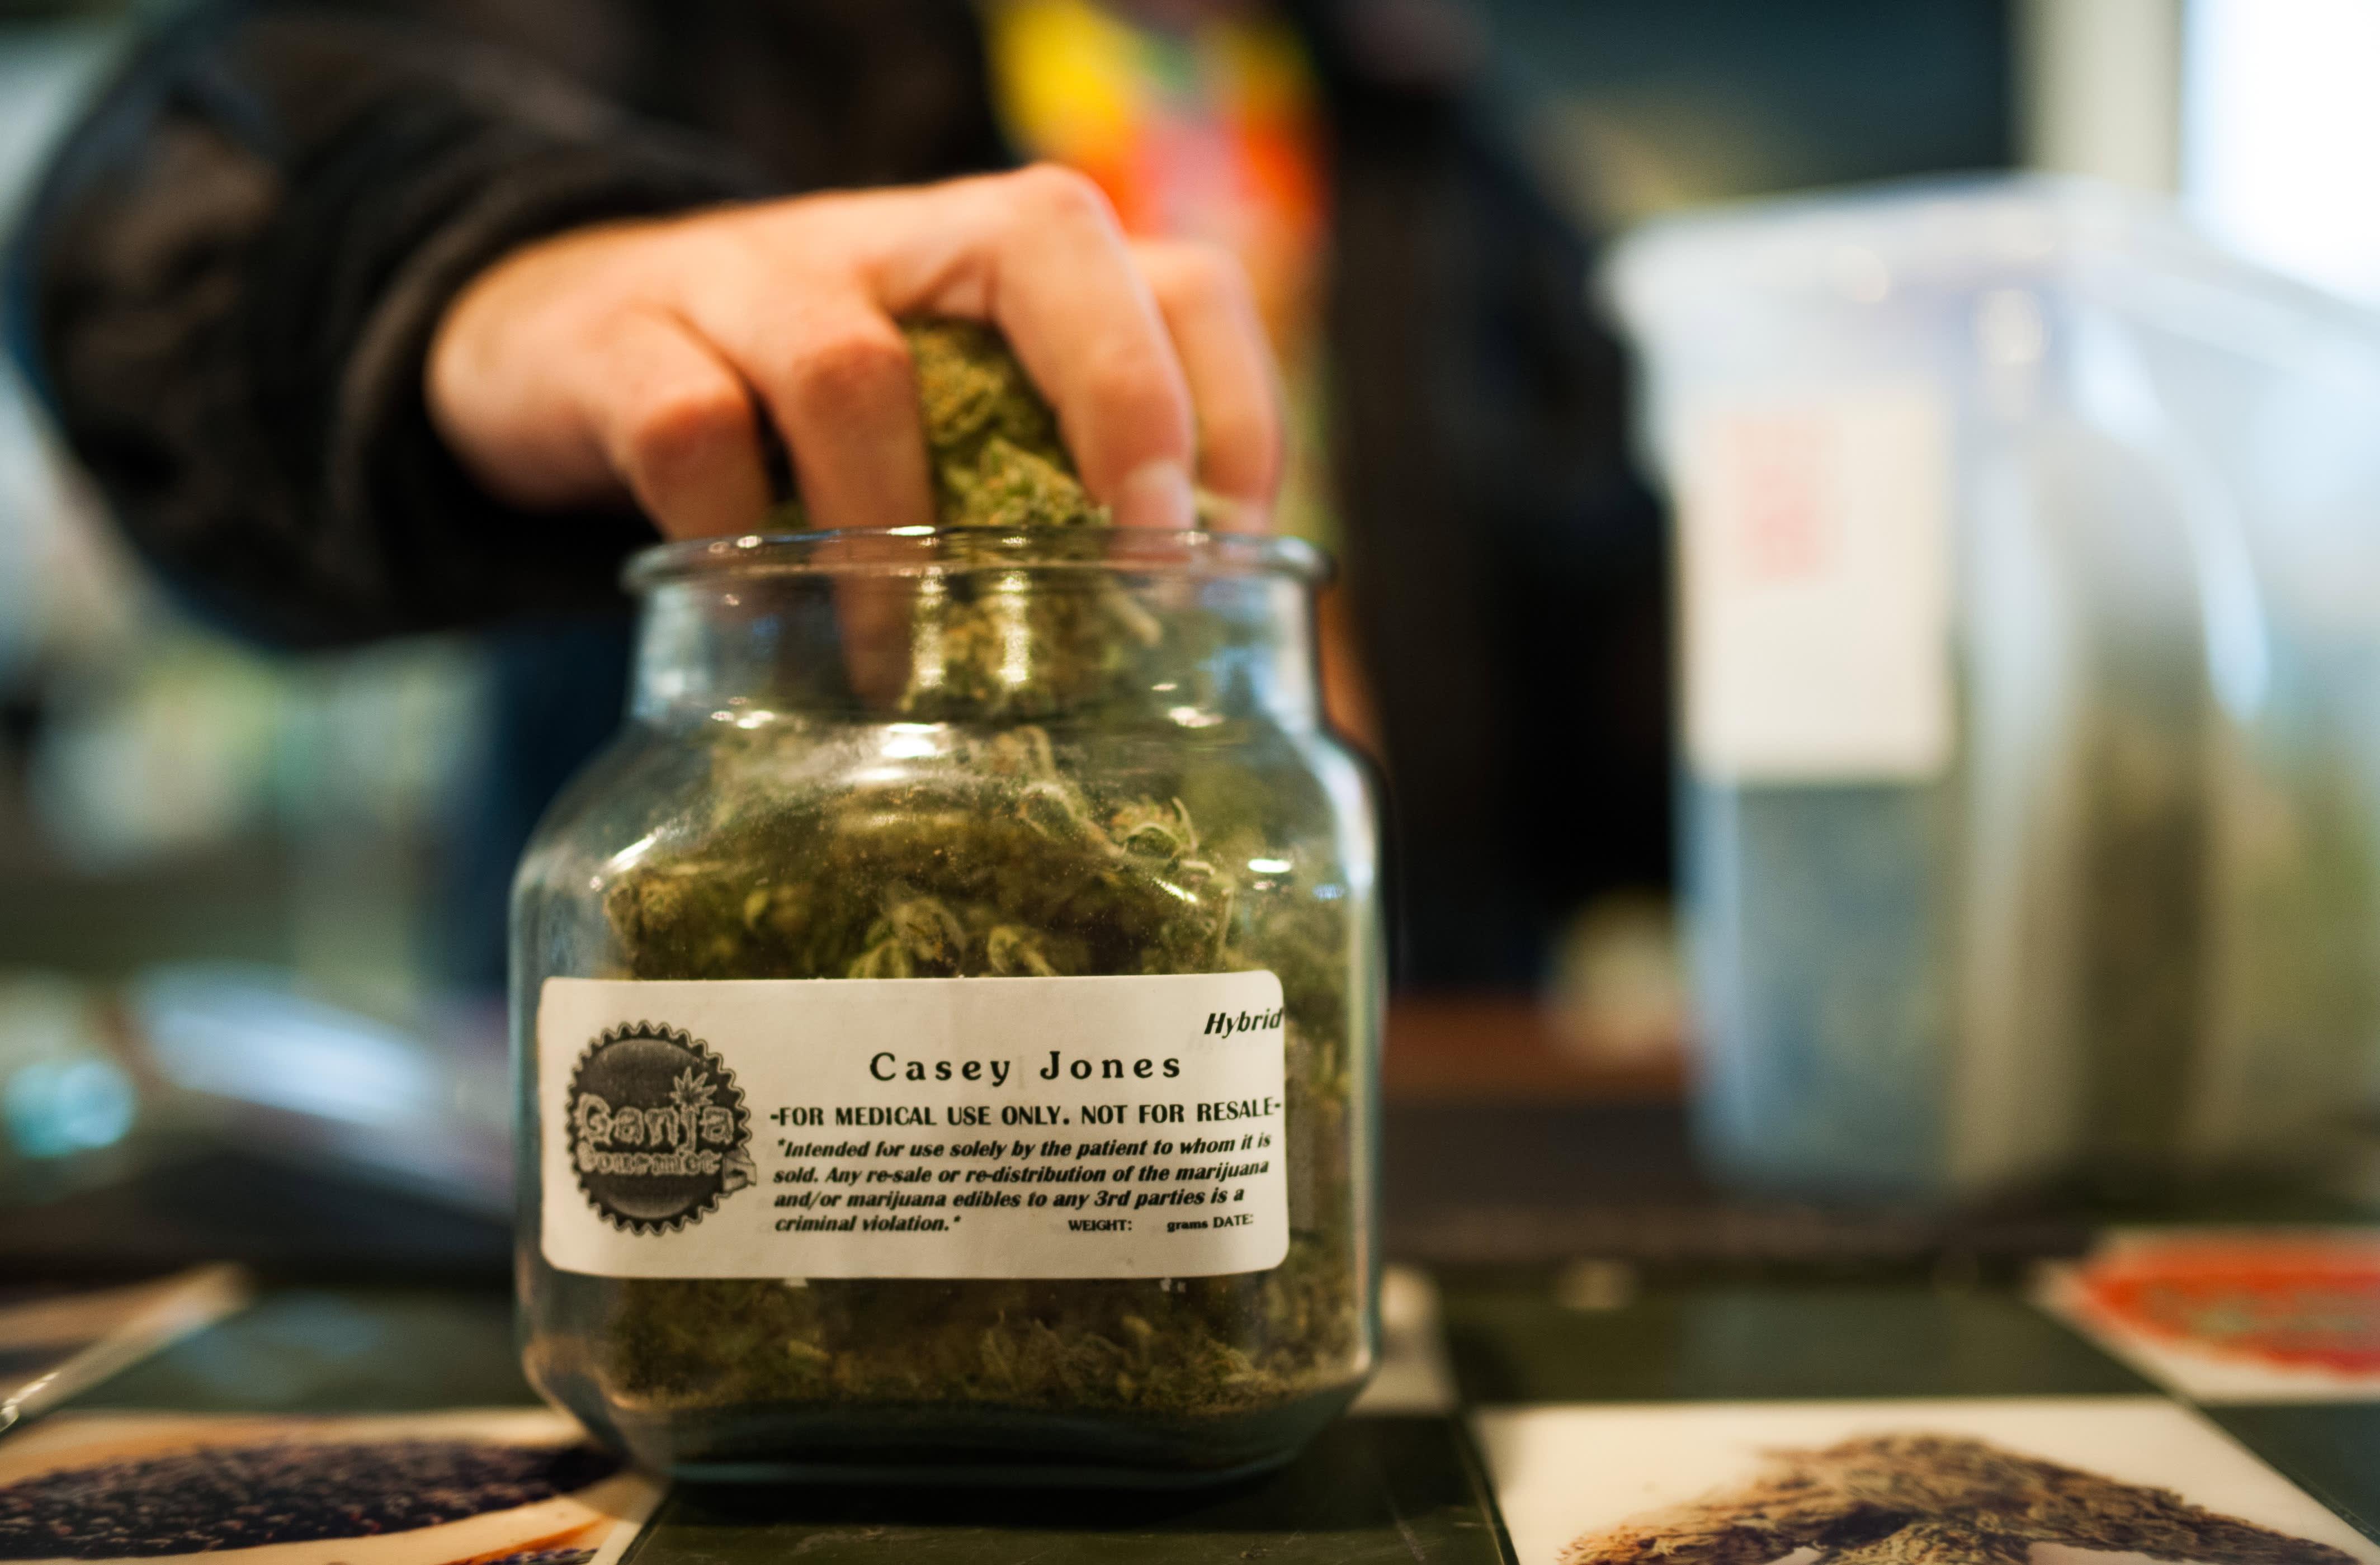 Marijuana market has 30-40%more upside, pot ETF company says after Joe Biden success thumbnail